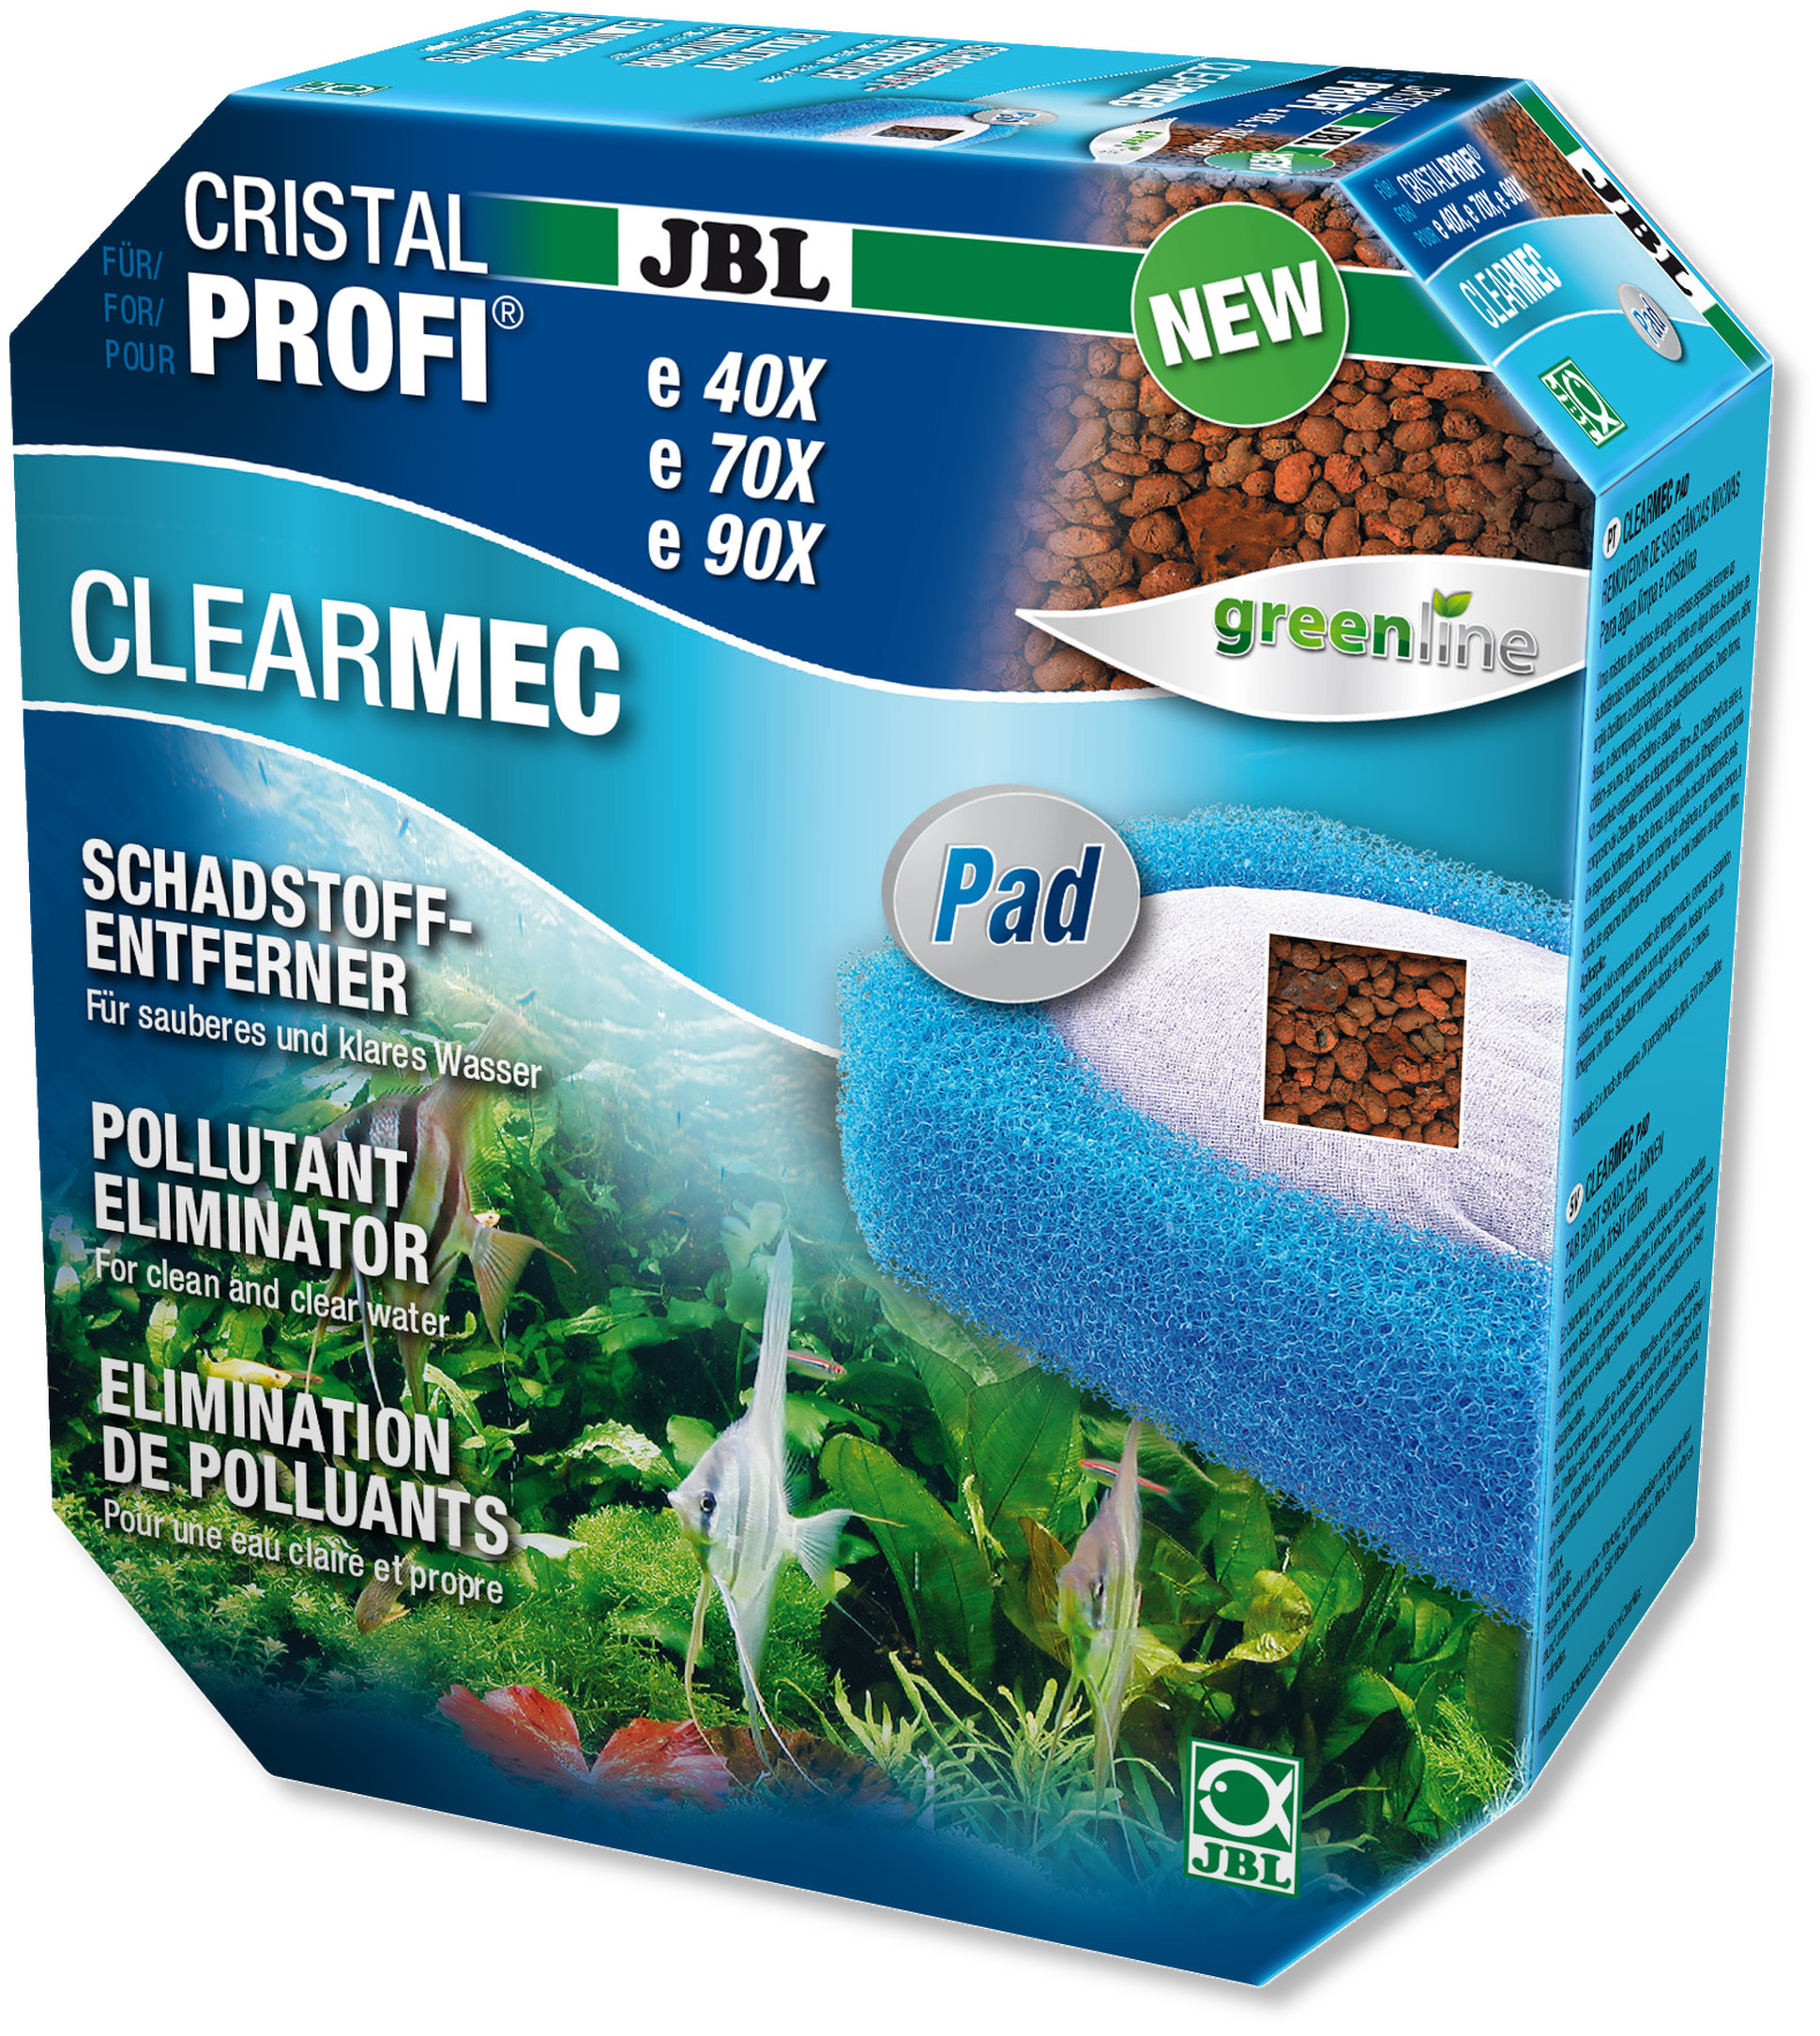 JBL ClearMec plus élimination des polluants pour filtres externes CristalProfi e700, e900, e401, e701, e901, e402, e702 et e902